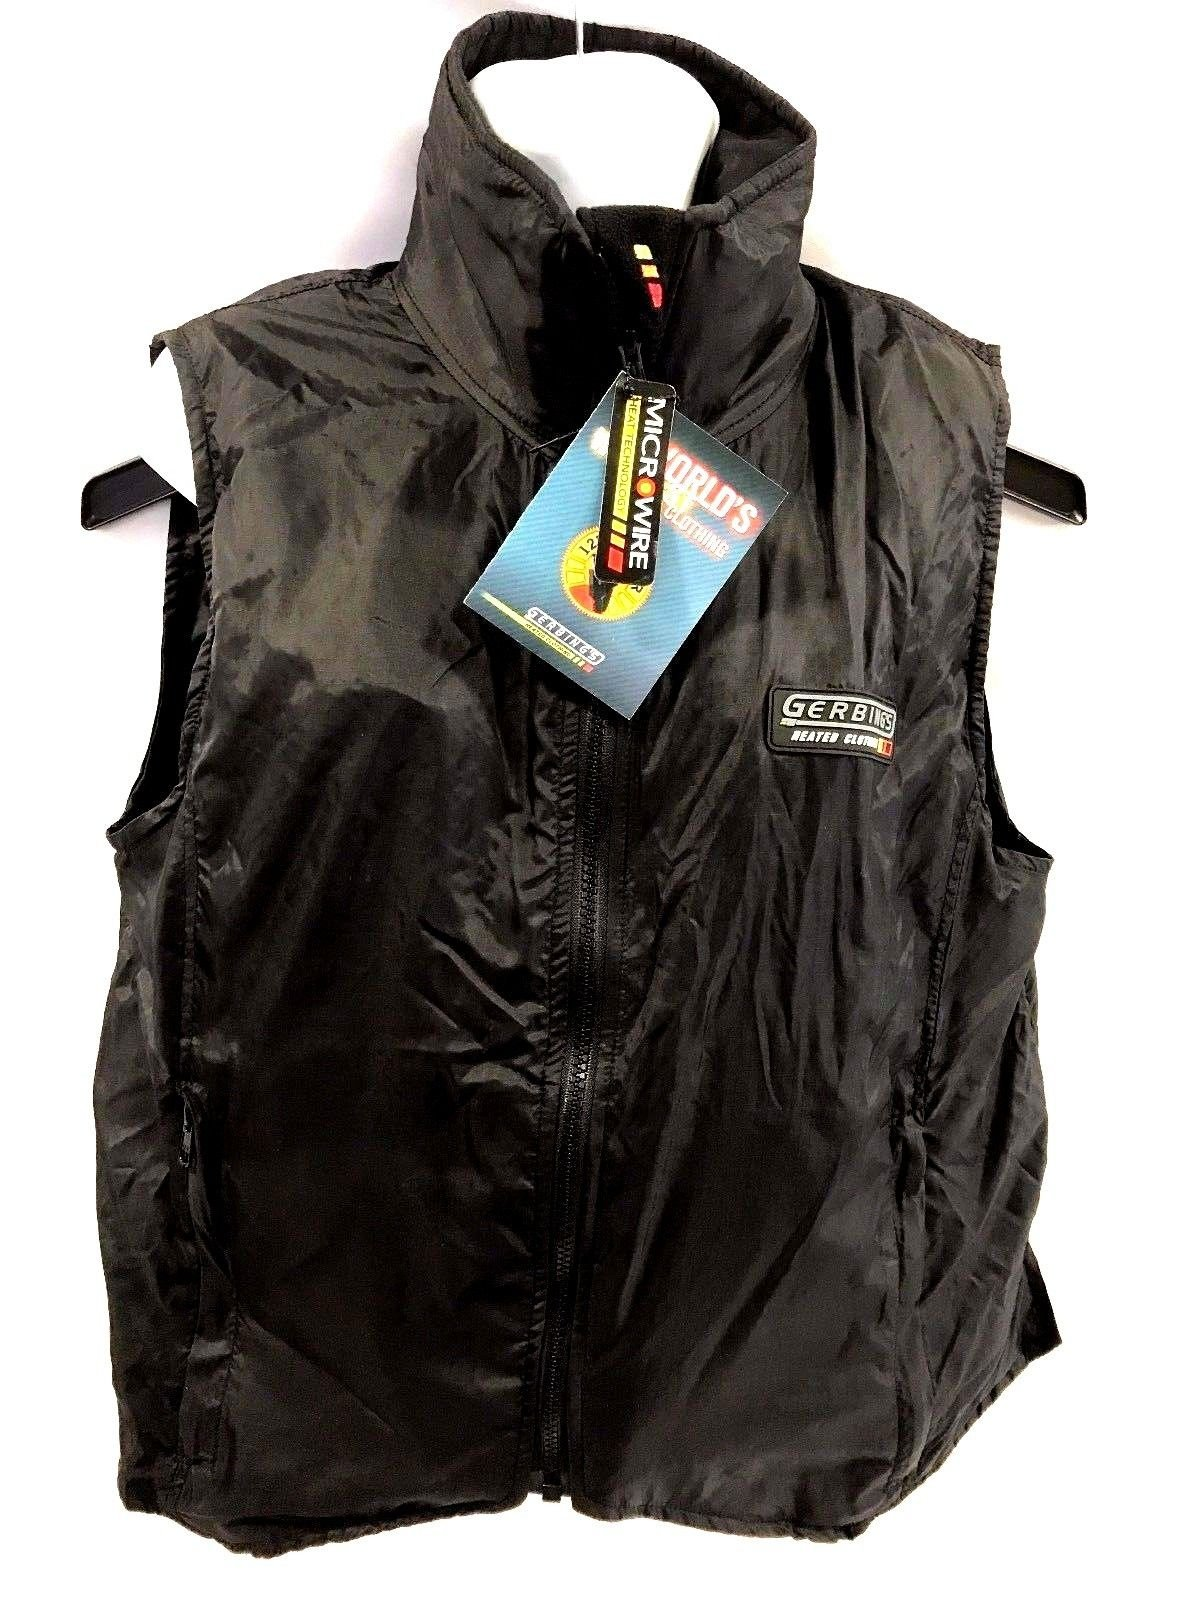 Gerbing Women's 12V DC Heated Vest Liner Size XS